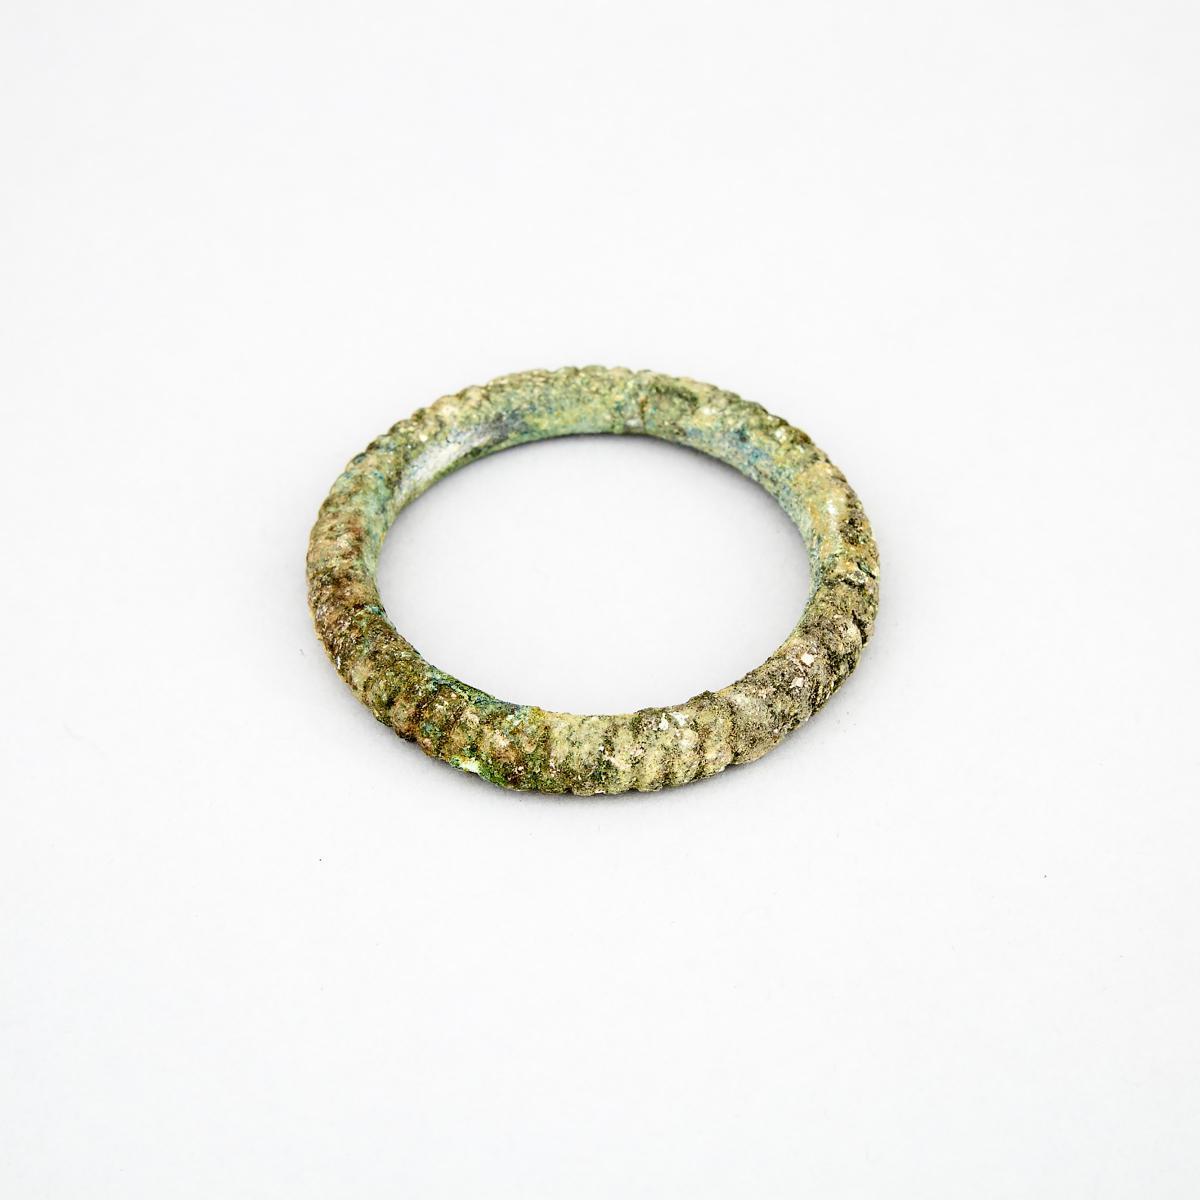 Greek or Roman Bronze Bracelet, diameter 2.8 in — 7.2 cm